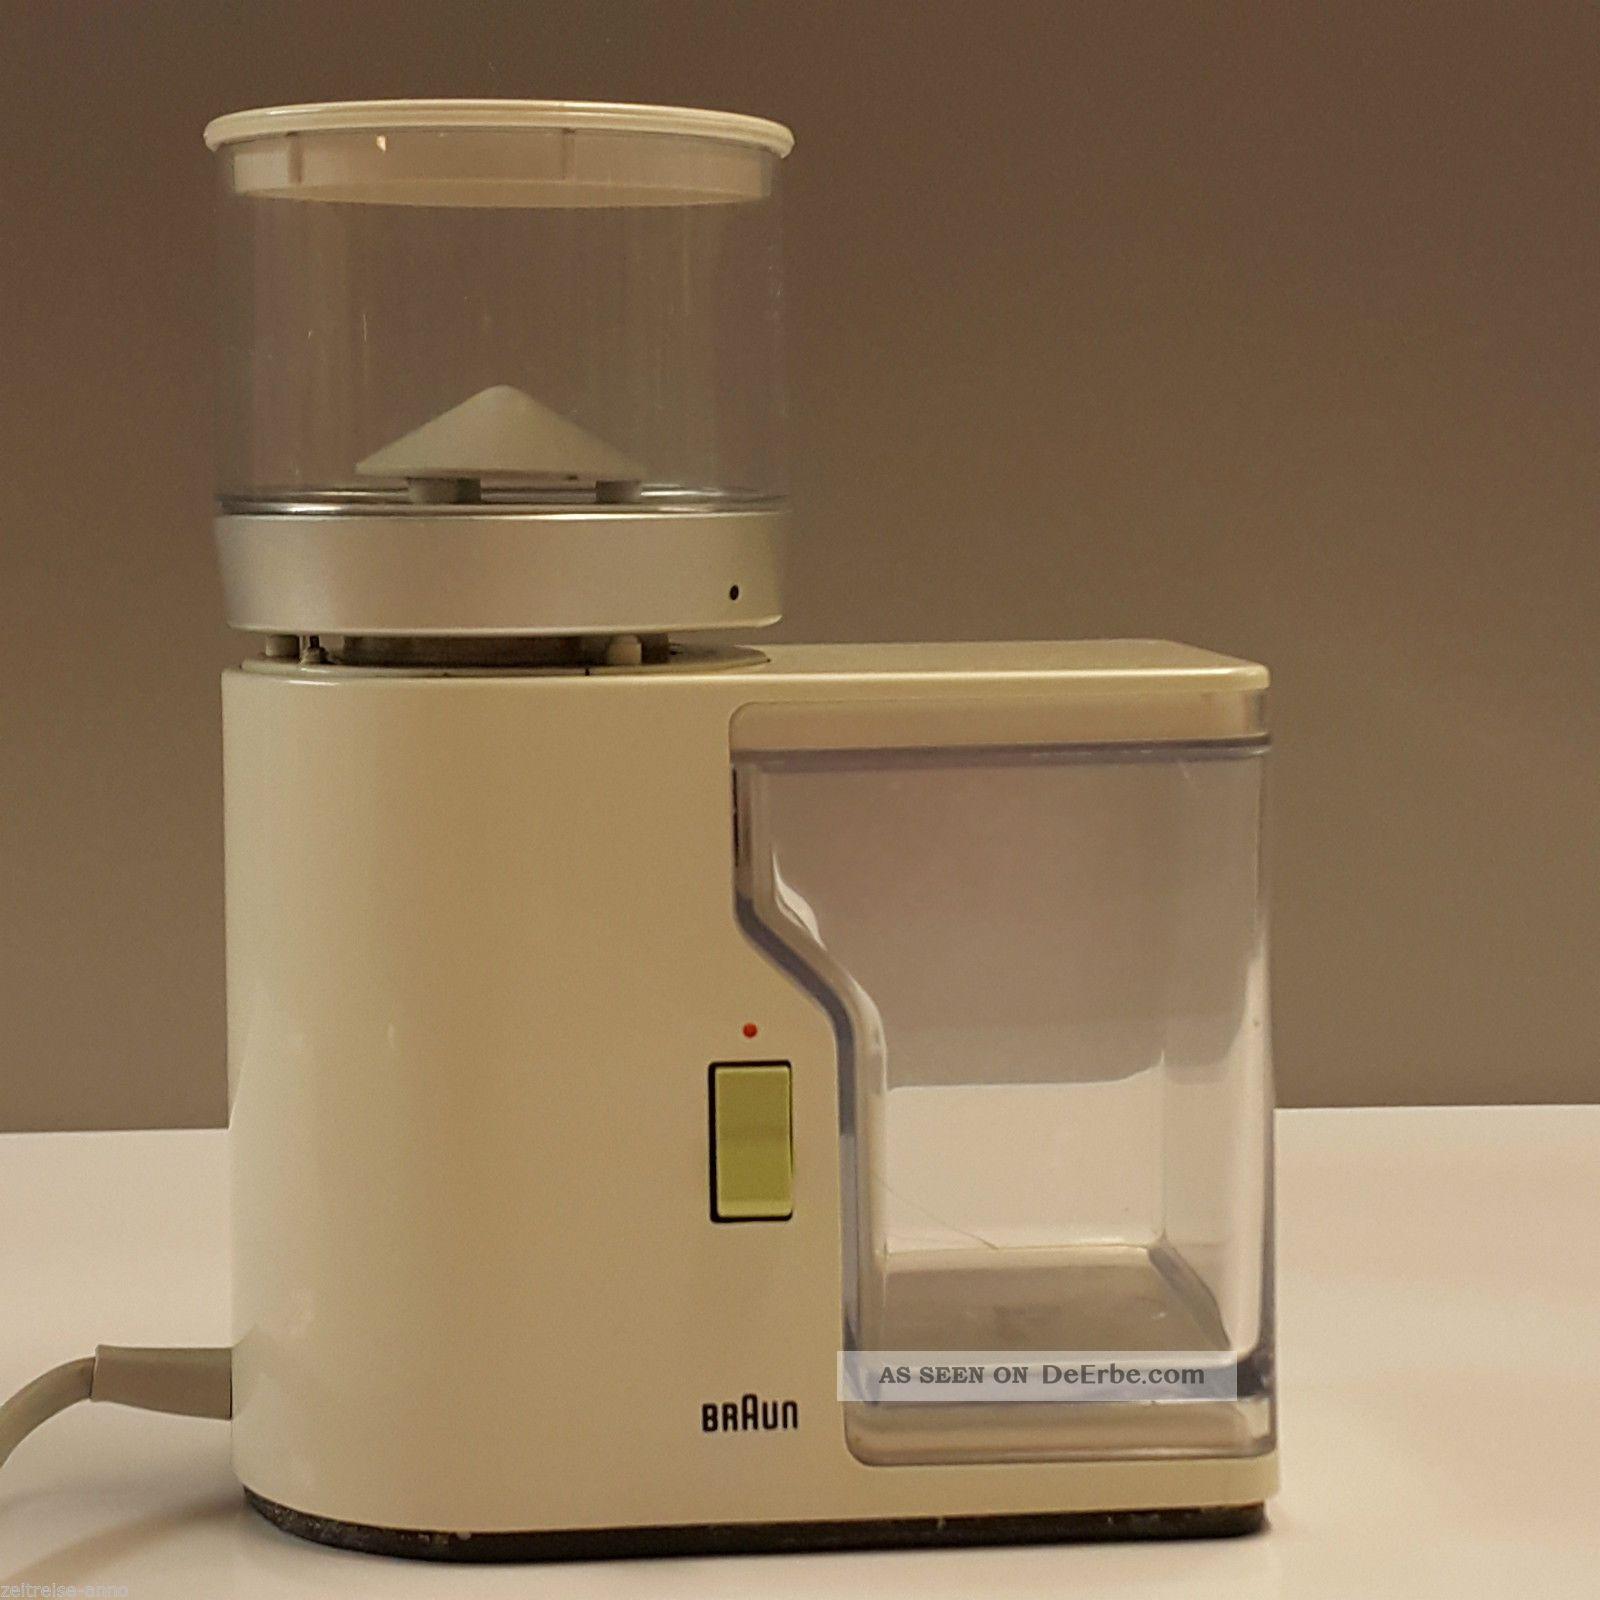 Braun Kmm 1 Kaffeemühle Aromatic Mokkamühle Espressomühle Design 1965 R.  Weiss 1960-1969 Bild